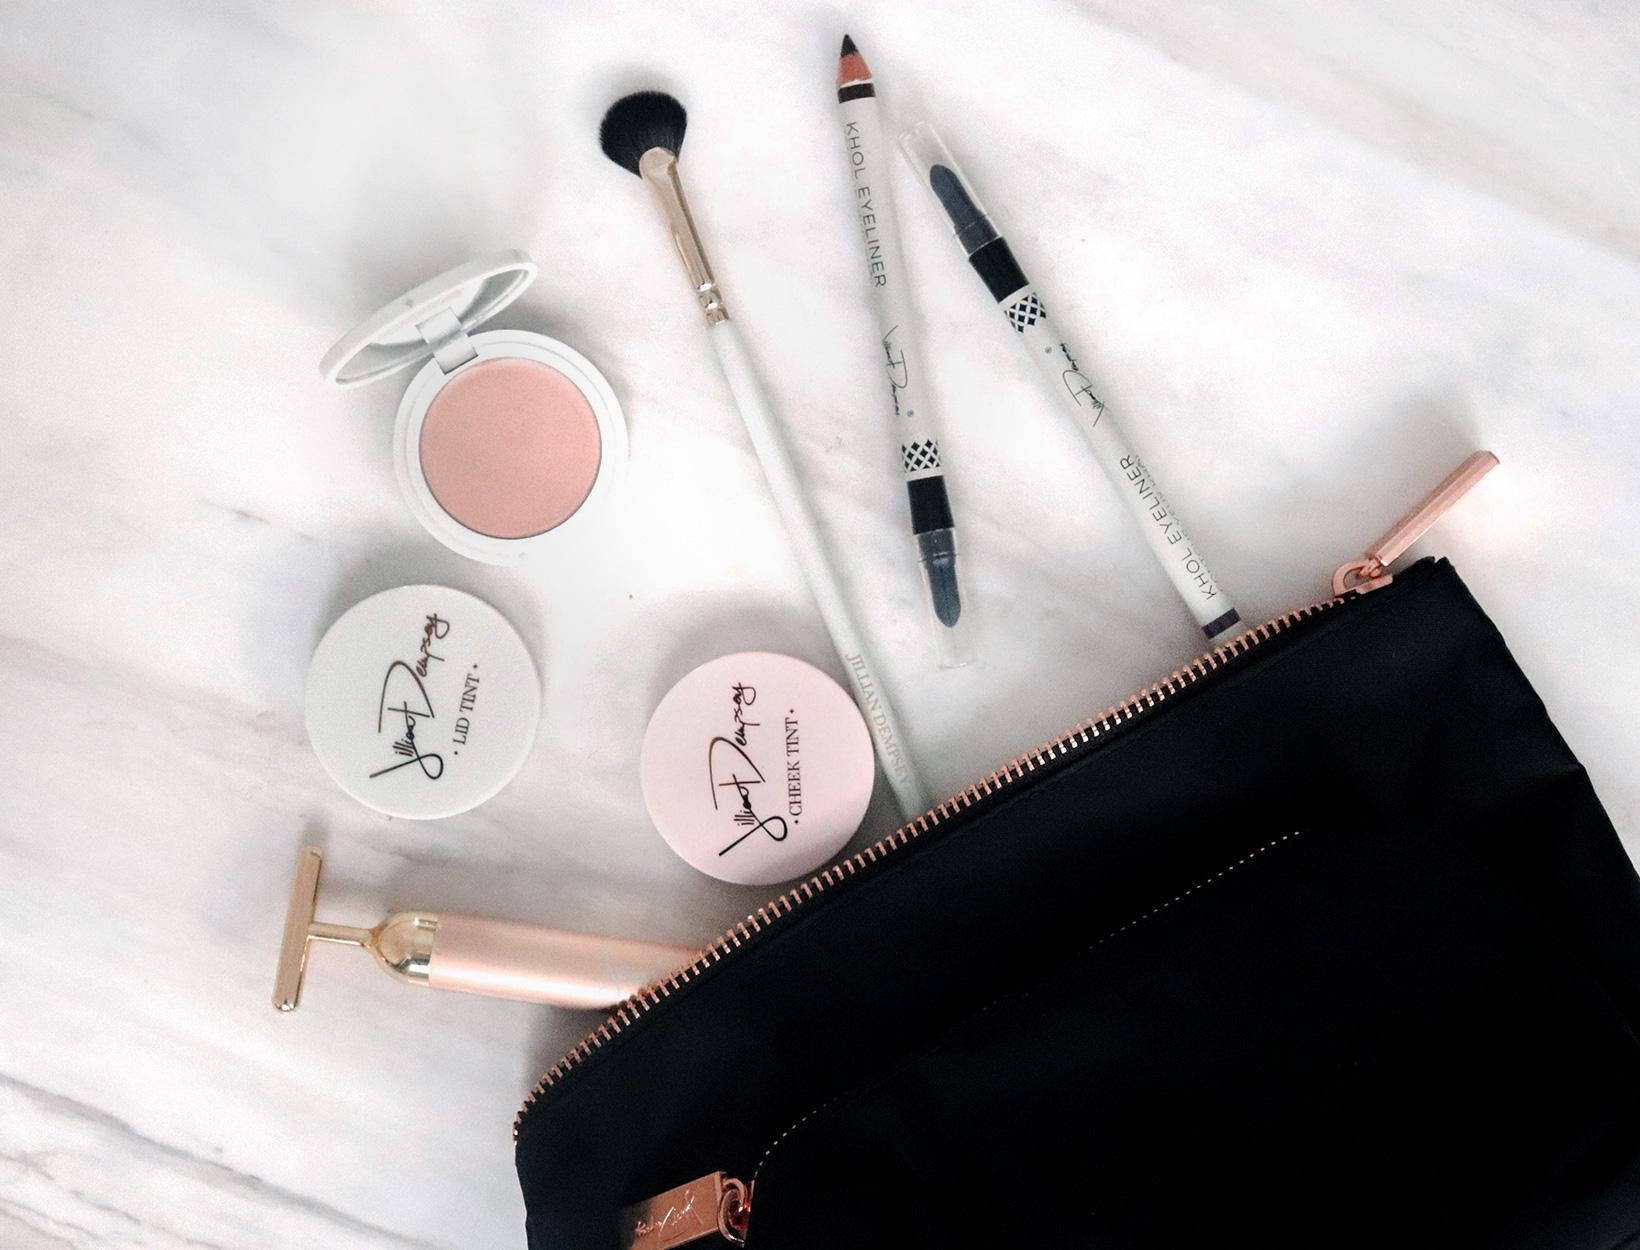 Godfrey's Guide: Makeup Bag Confidential